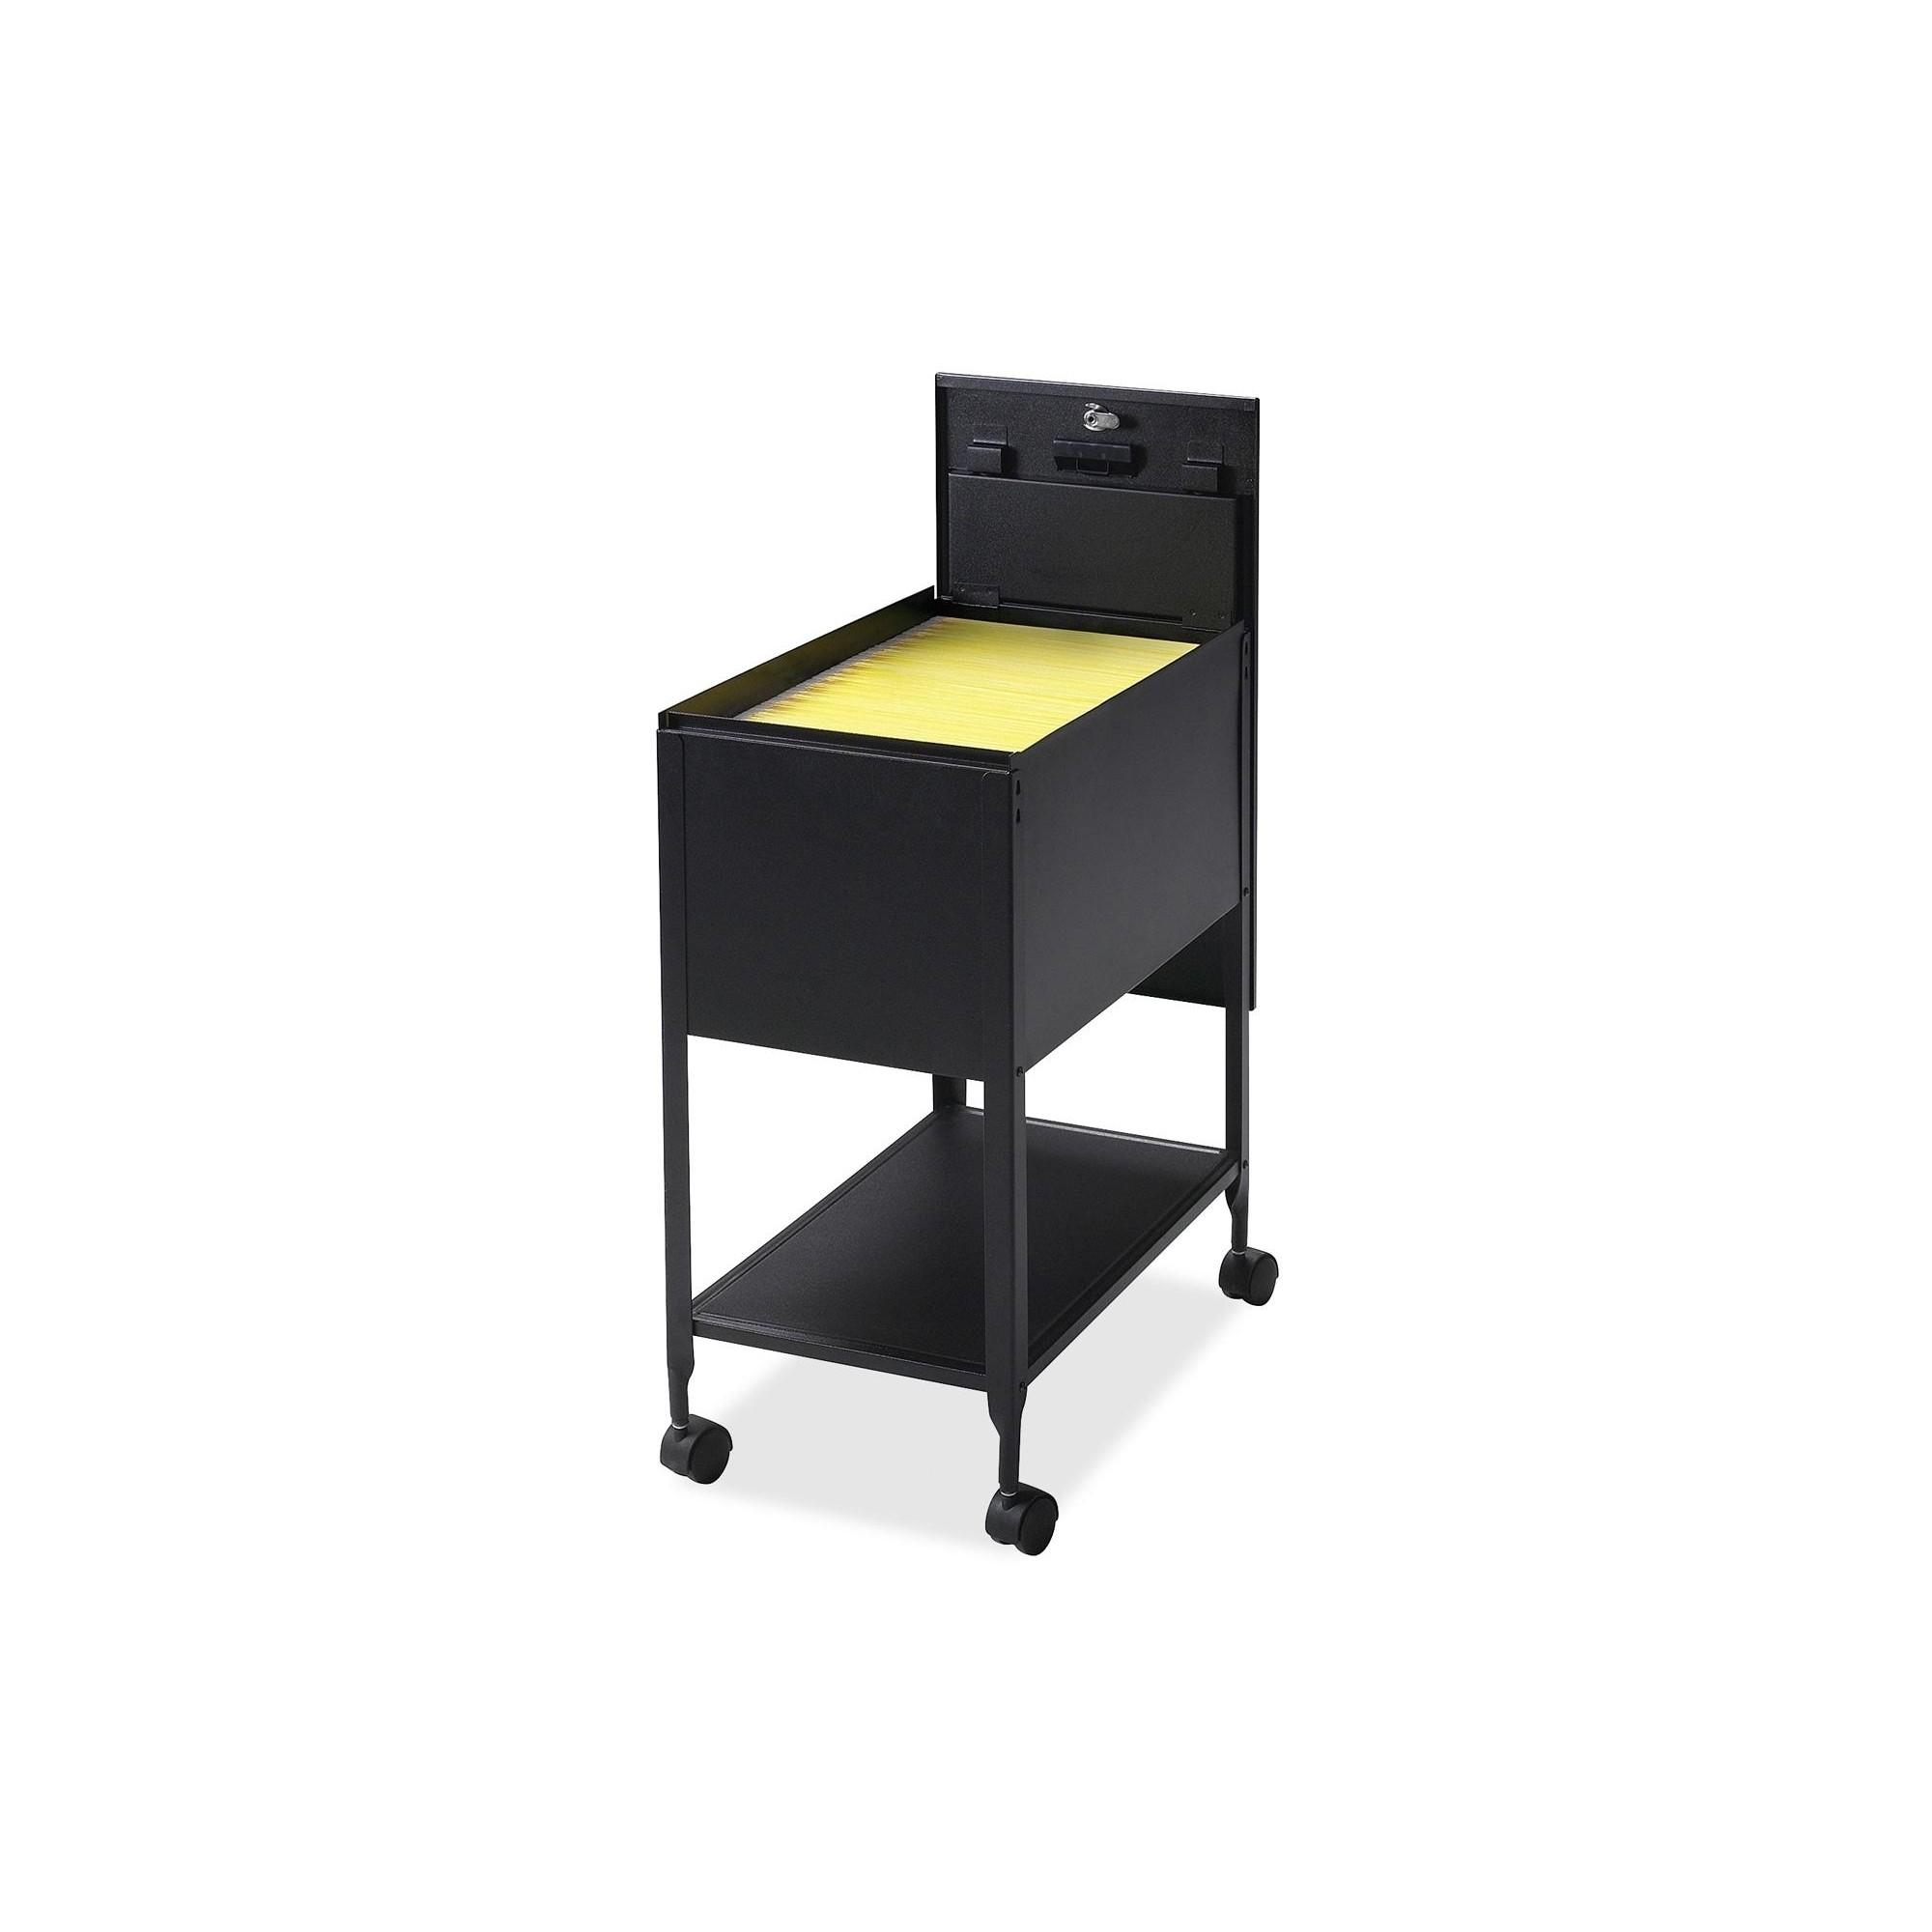 Lorell vertical filing cabinet mobile cart steel black